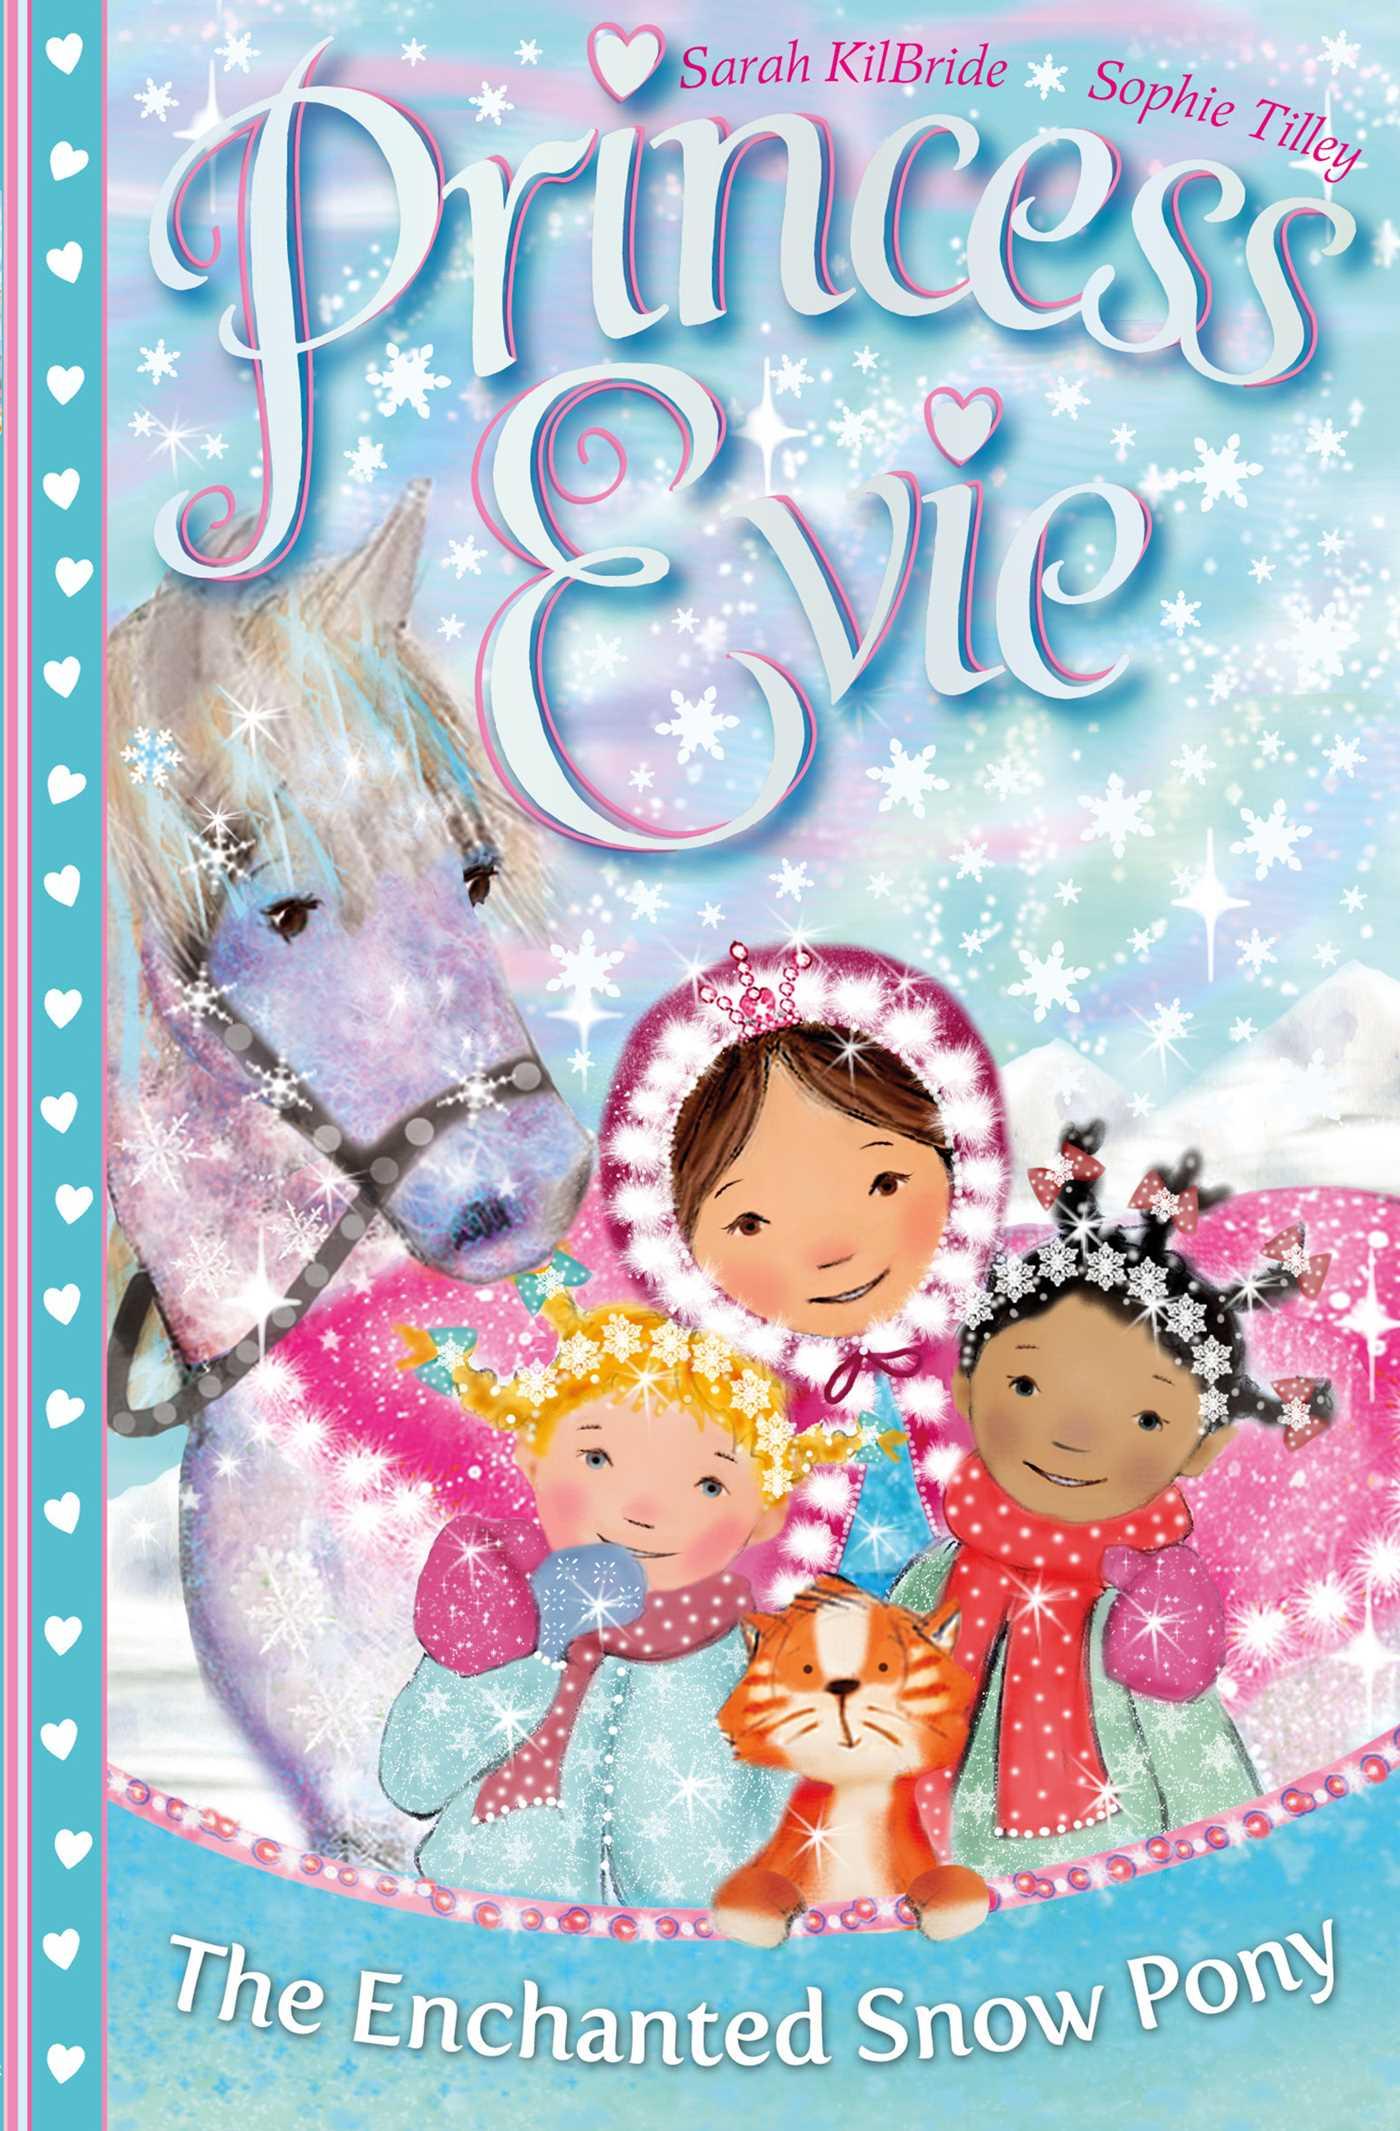 Princess evie the enchanted snow pony 9781471121821 hr